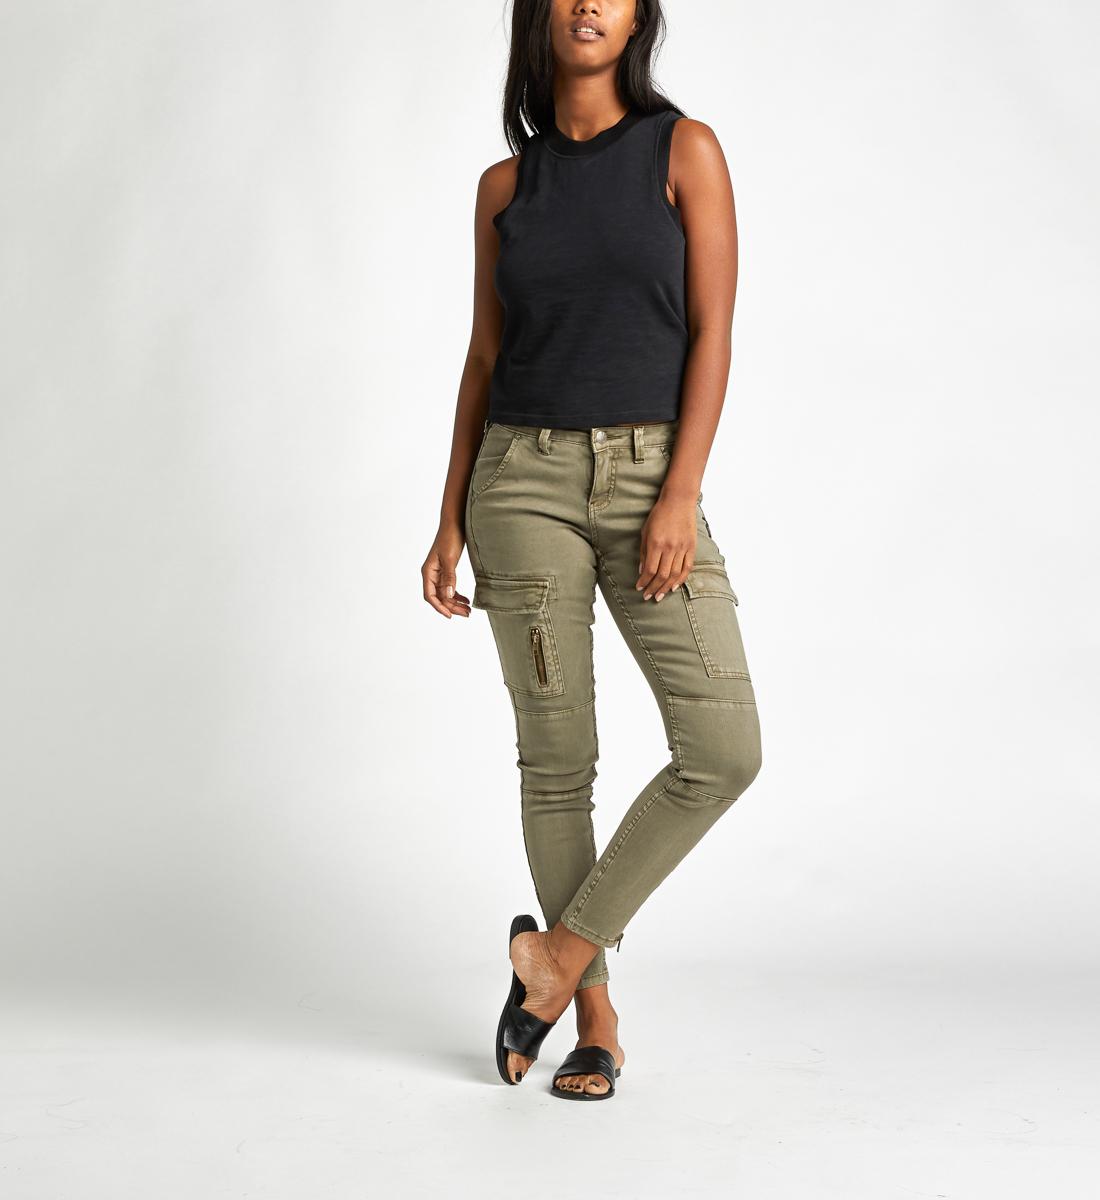 dd7cbbea Skinny Cargo Mid Rise Skinny Leg Pants, Olive, hi-res